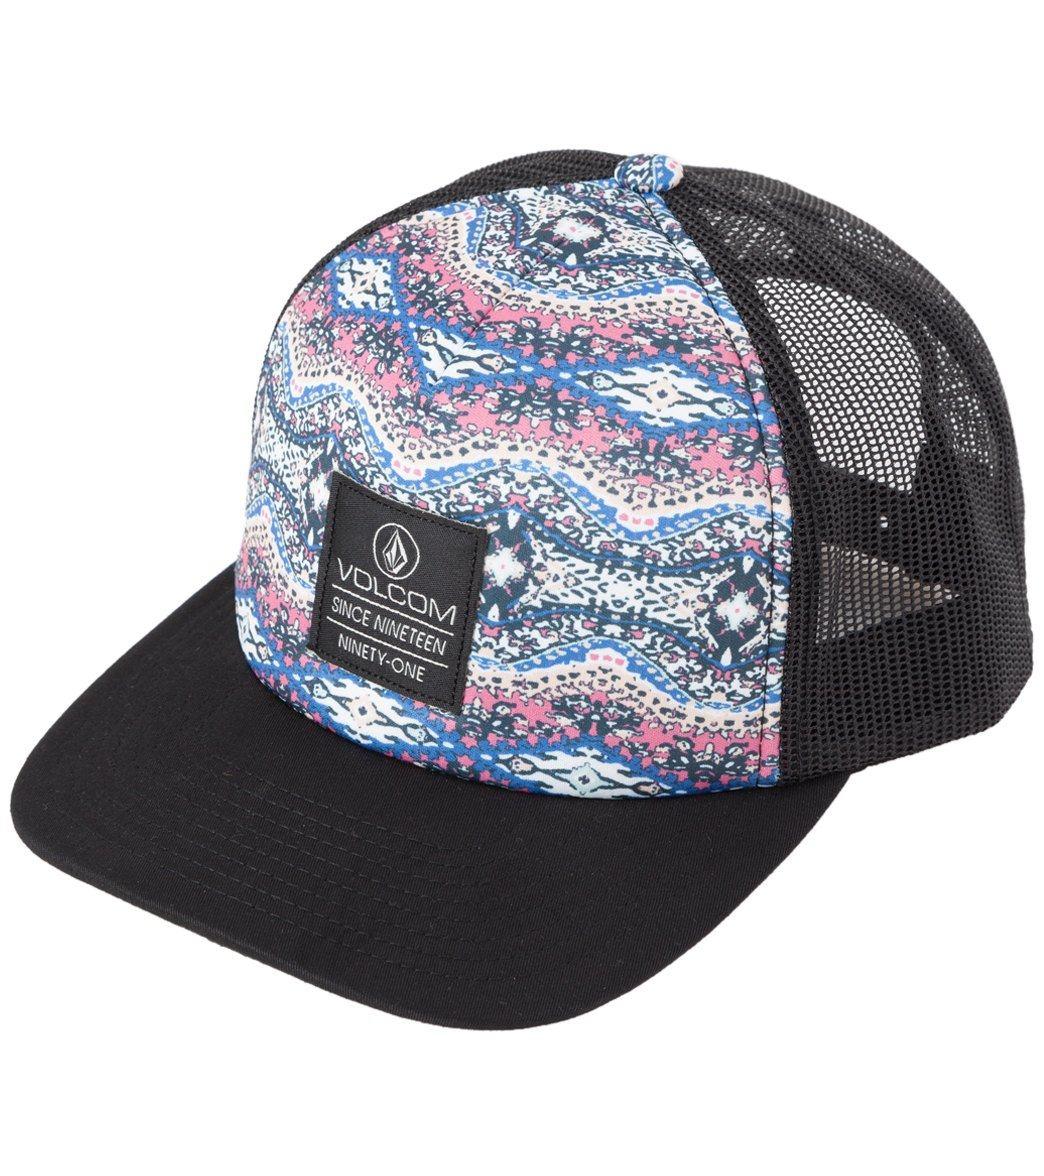 Volcom Nacho Trucker Mauve Hat at SwimOutlet.com 6e757962b851